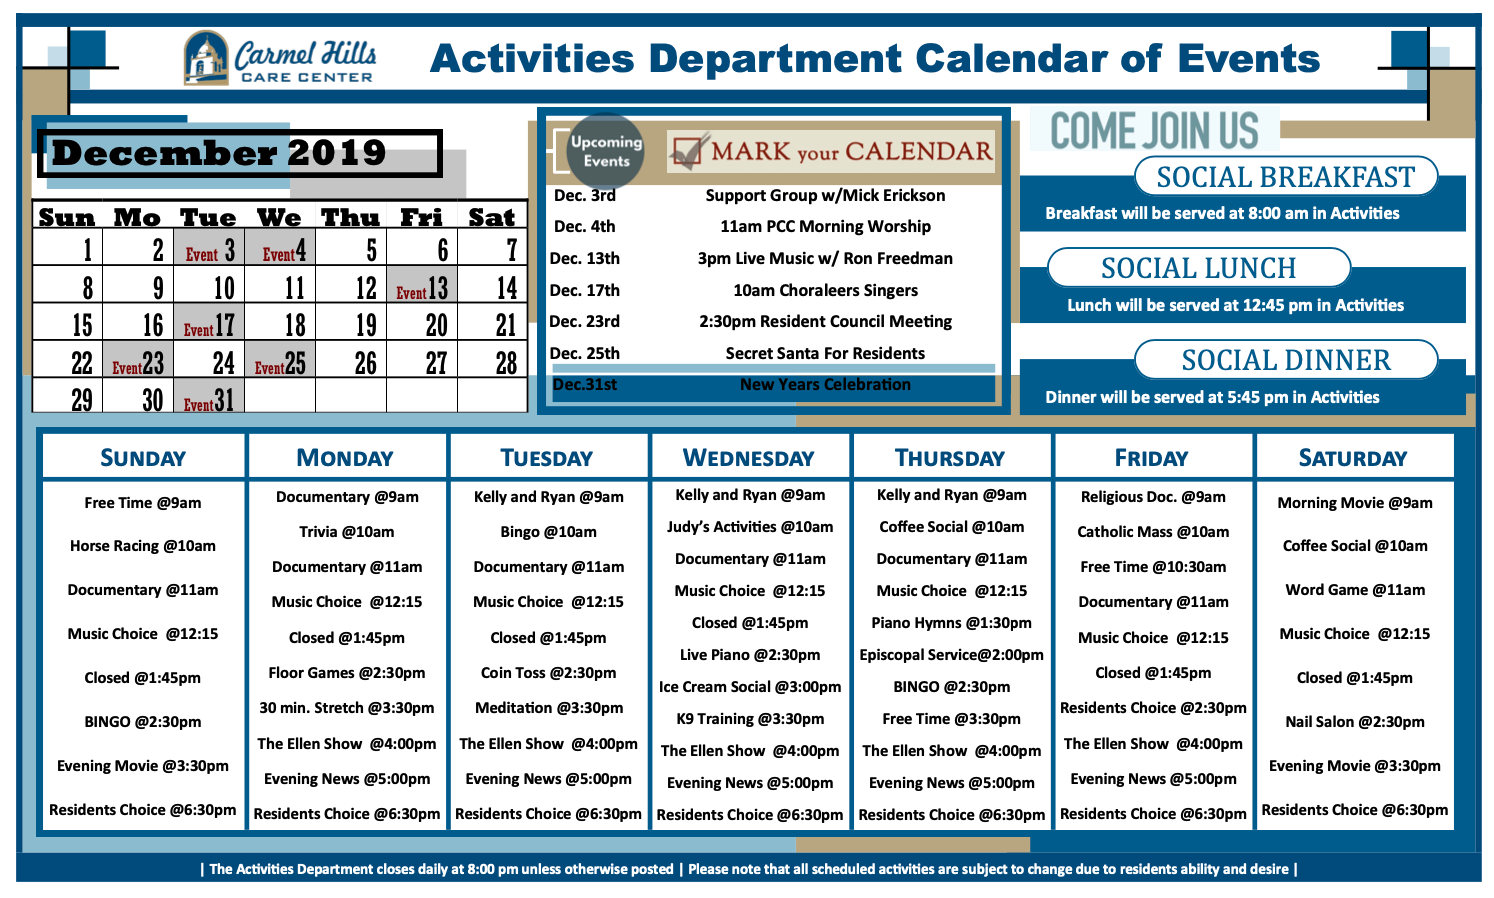 Carmel Hills December 2019 activity calendar